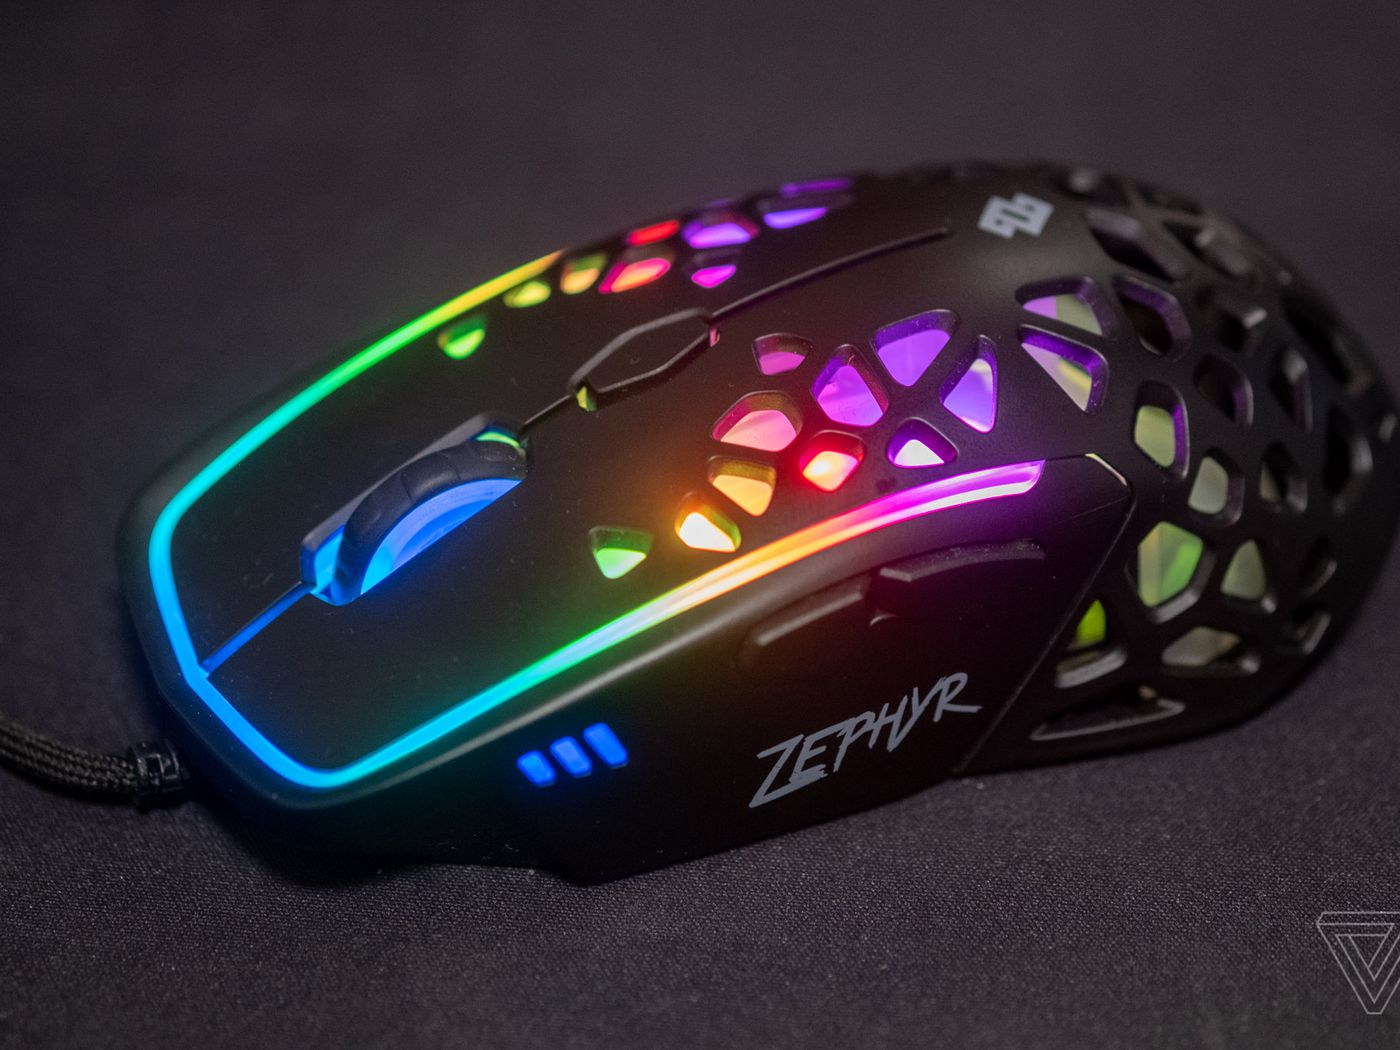 Pengertian PC adalah: Mouse